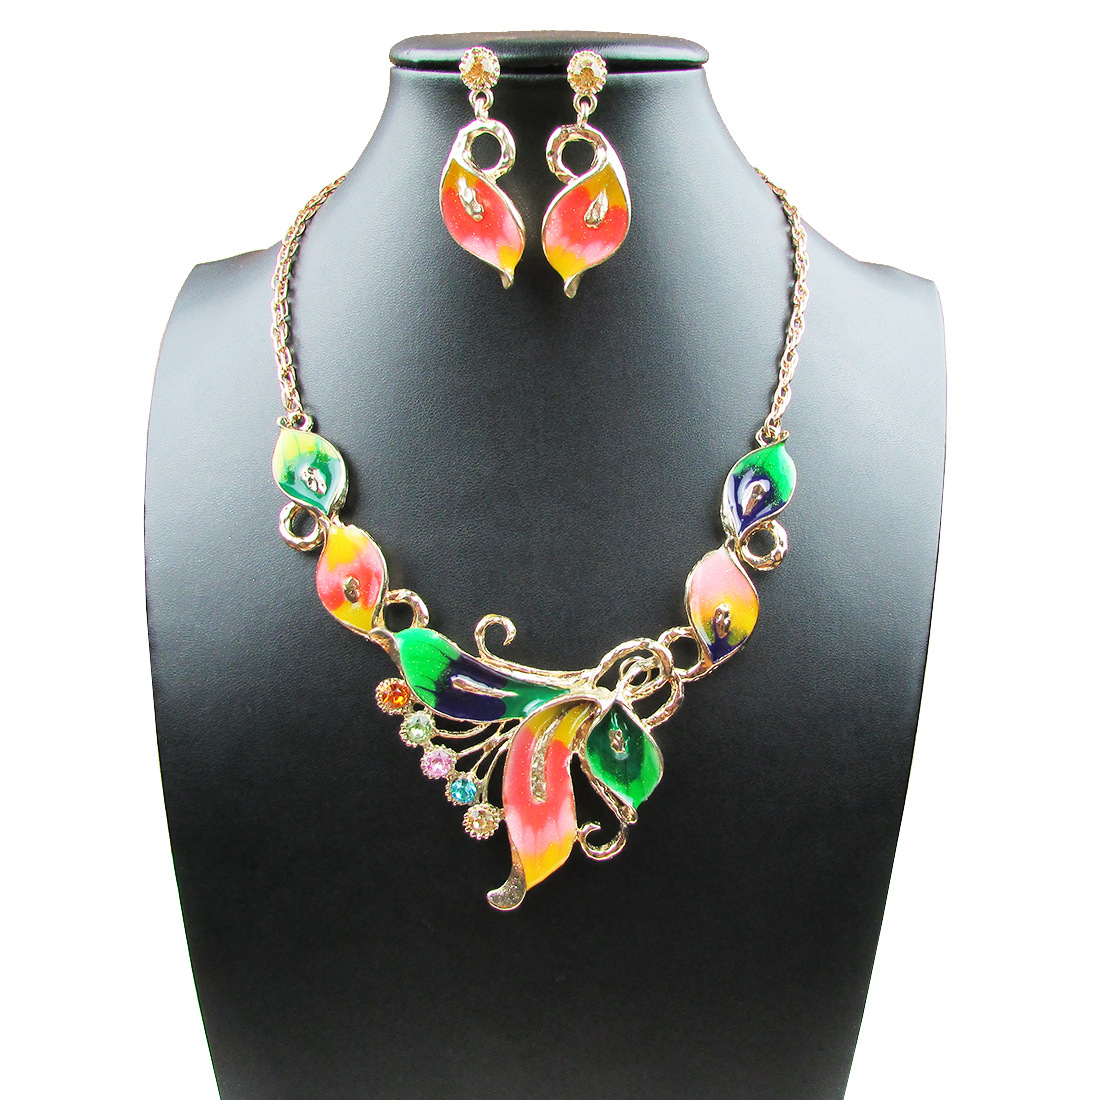 New Butterfly Jewelry Sets Necklace Earring+Bracelet Crystal Set Fashion G4